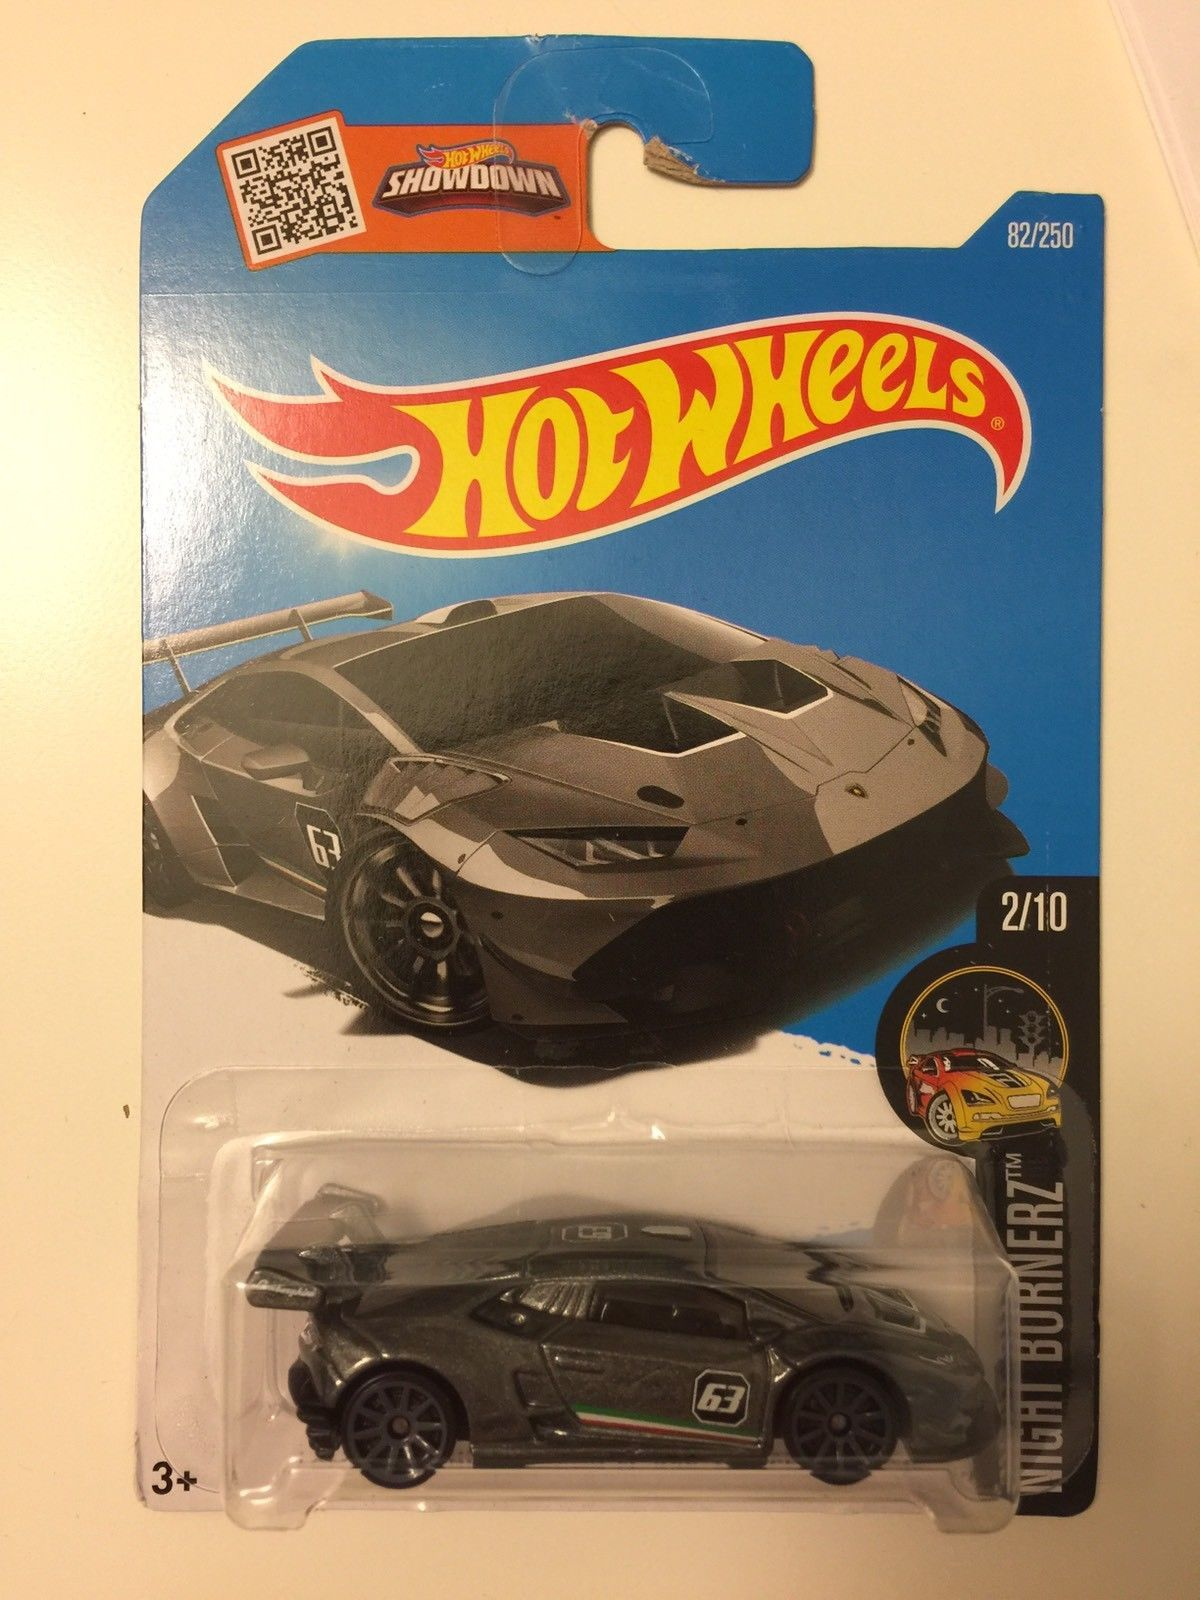 d9373bd229b4a5663006b096dc59b342 Marvelous Lamborghini Huracan Hack asphalt 8 Cars Trend